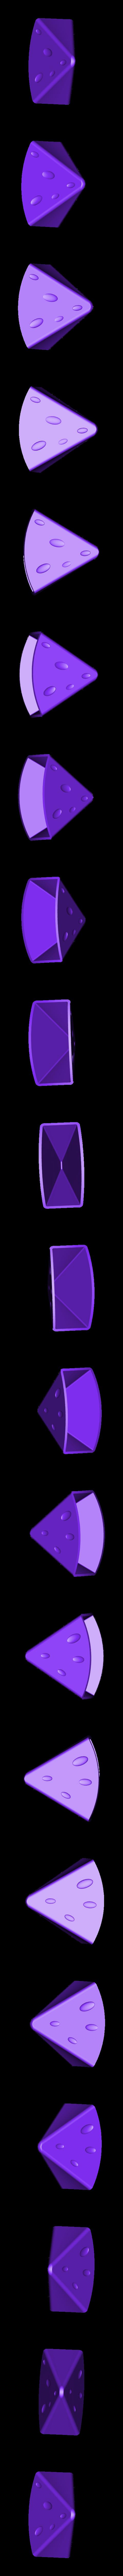 RED_PRINT.stl Download free STL file Water Melon Pill Box • 3D printer object, NormallyBen